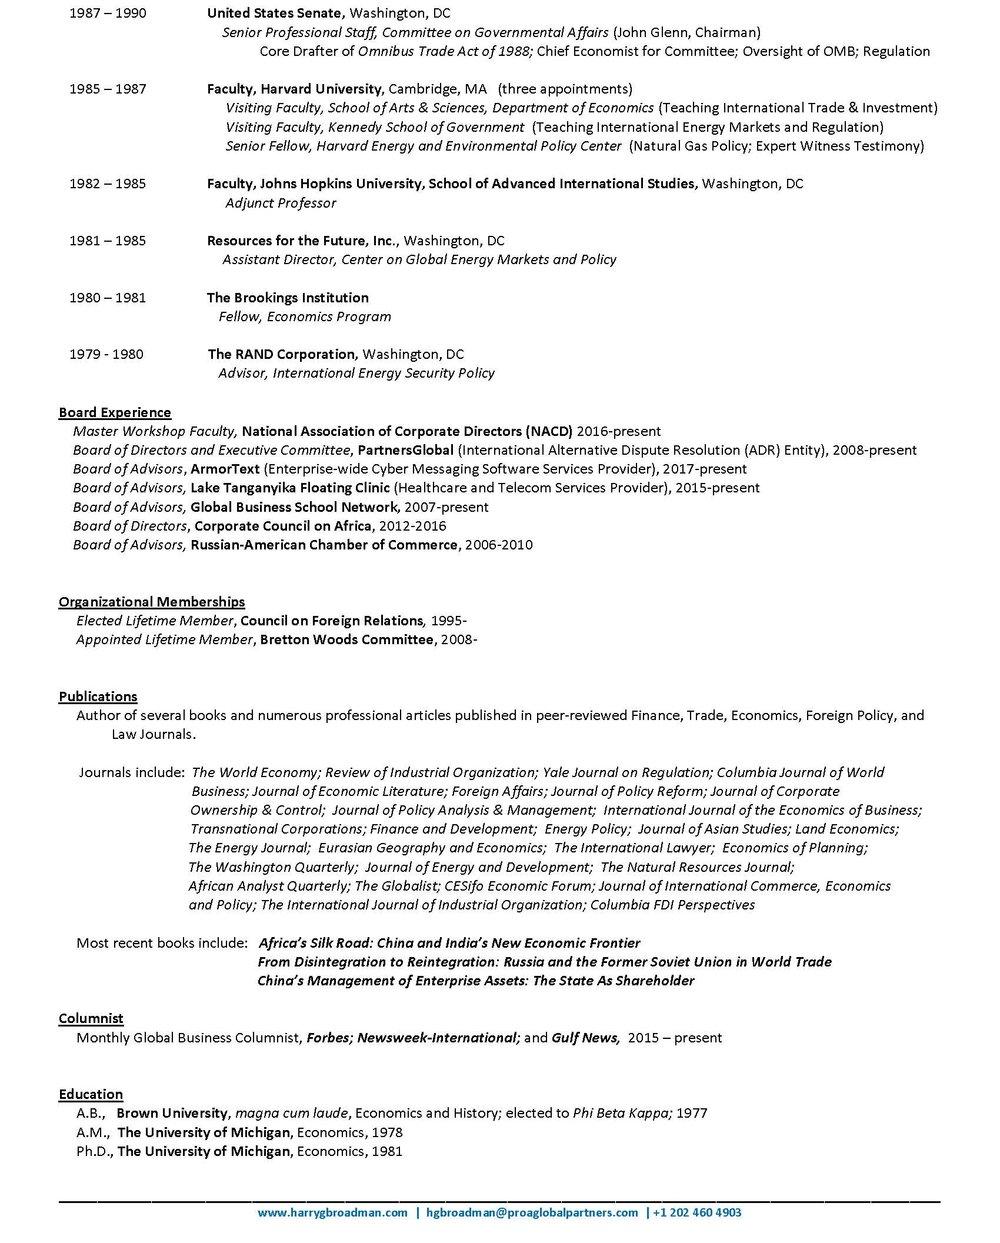 Broadman CV  EXW 2-21-18_Page_2.jpg